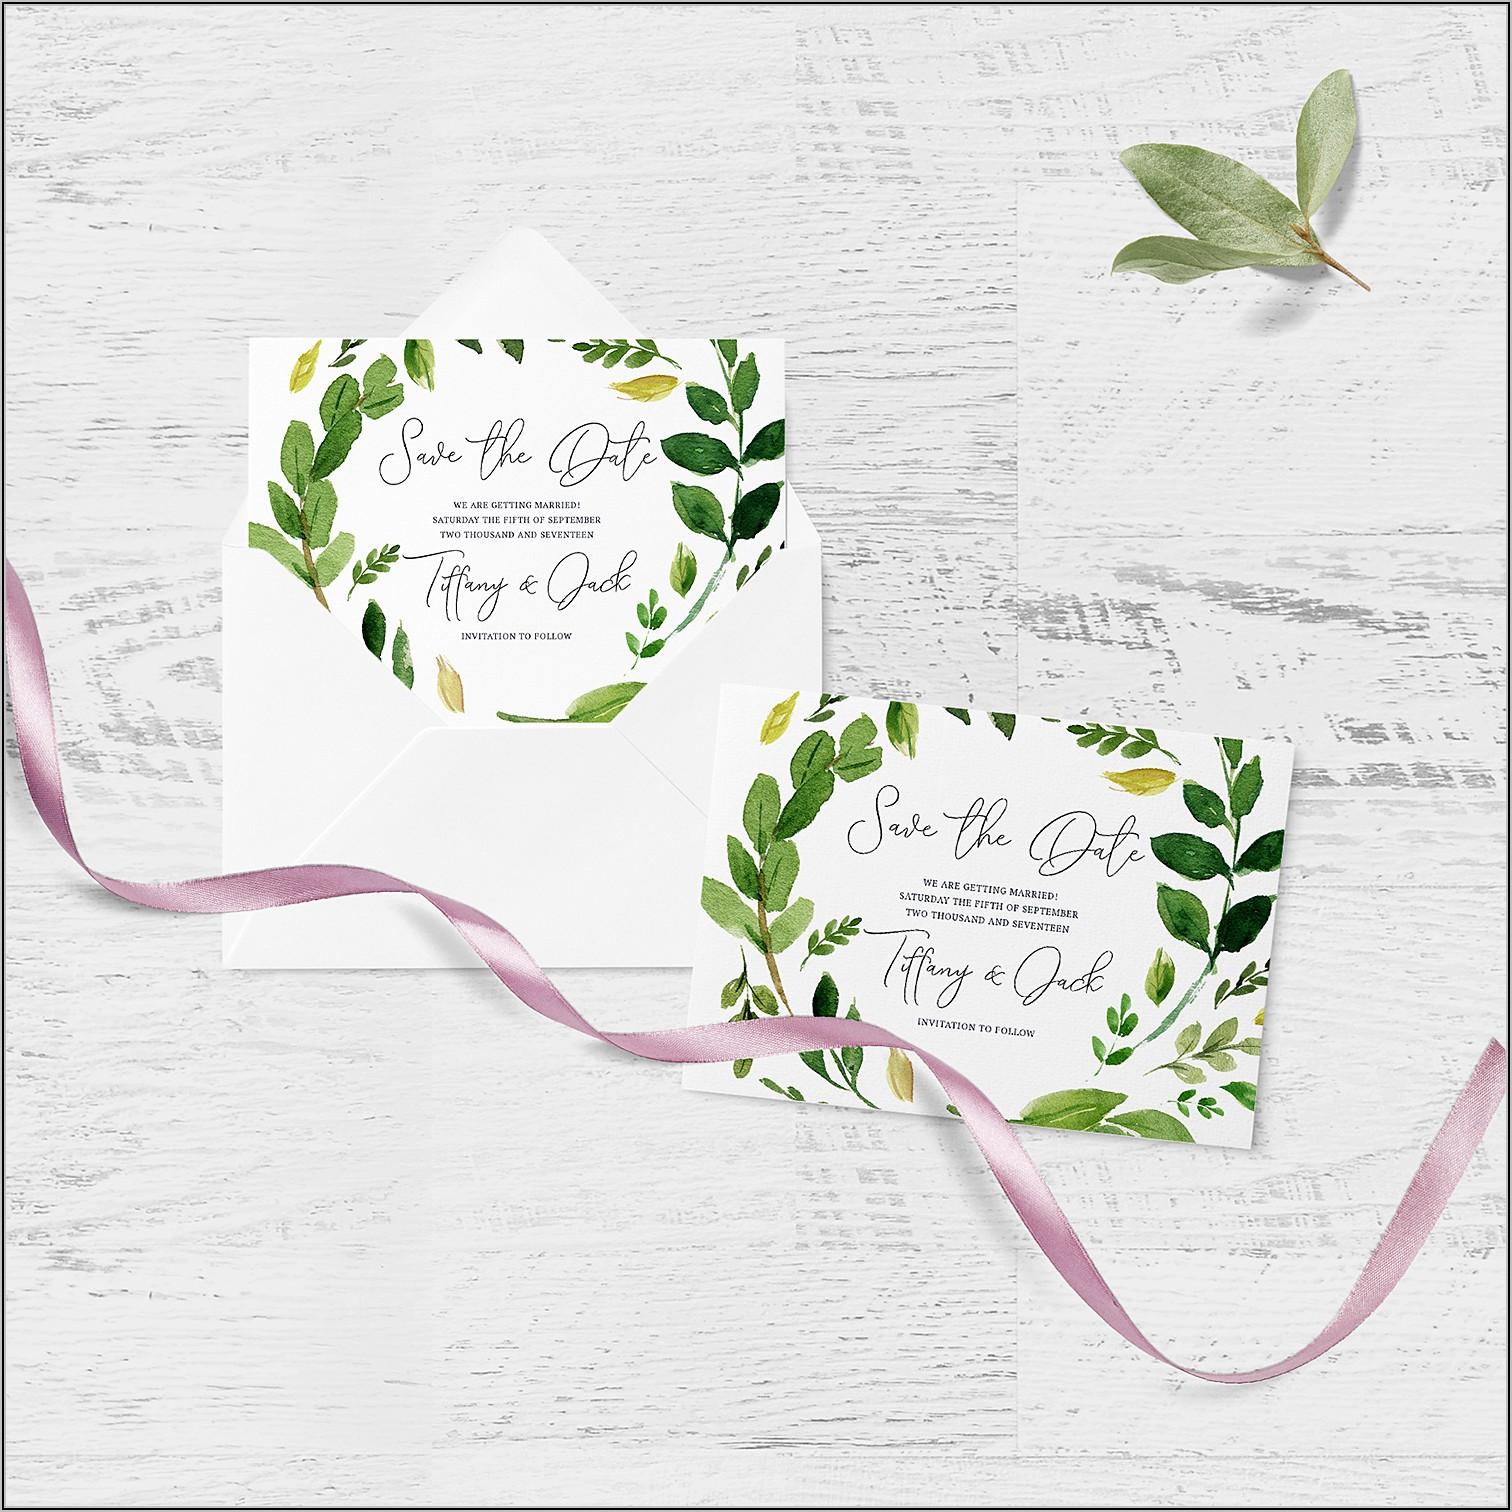 Card And Envelope Mockup Free